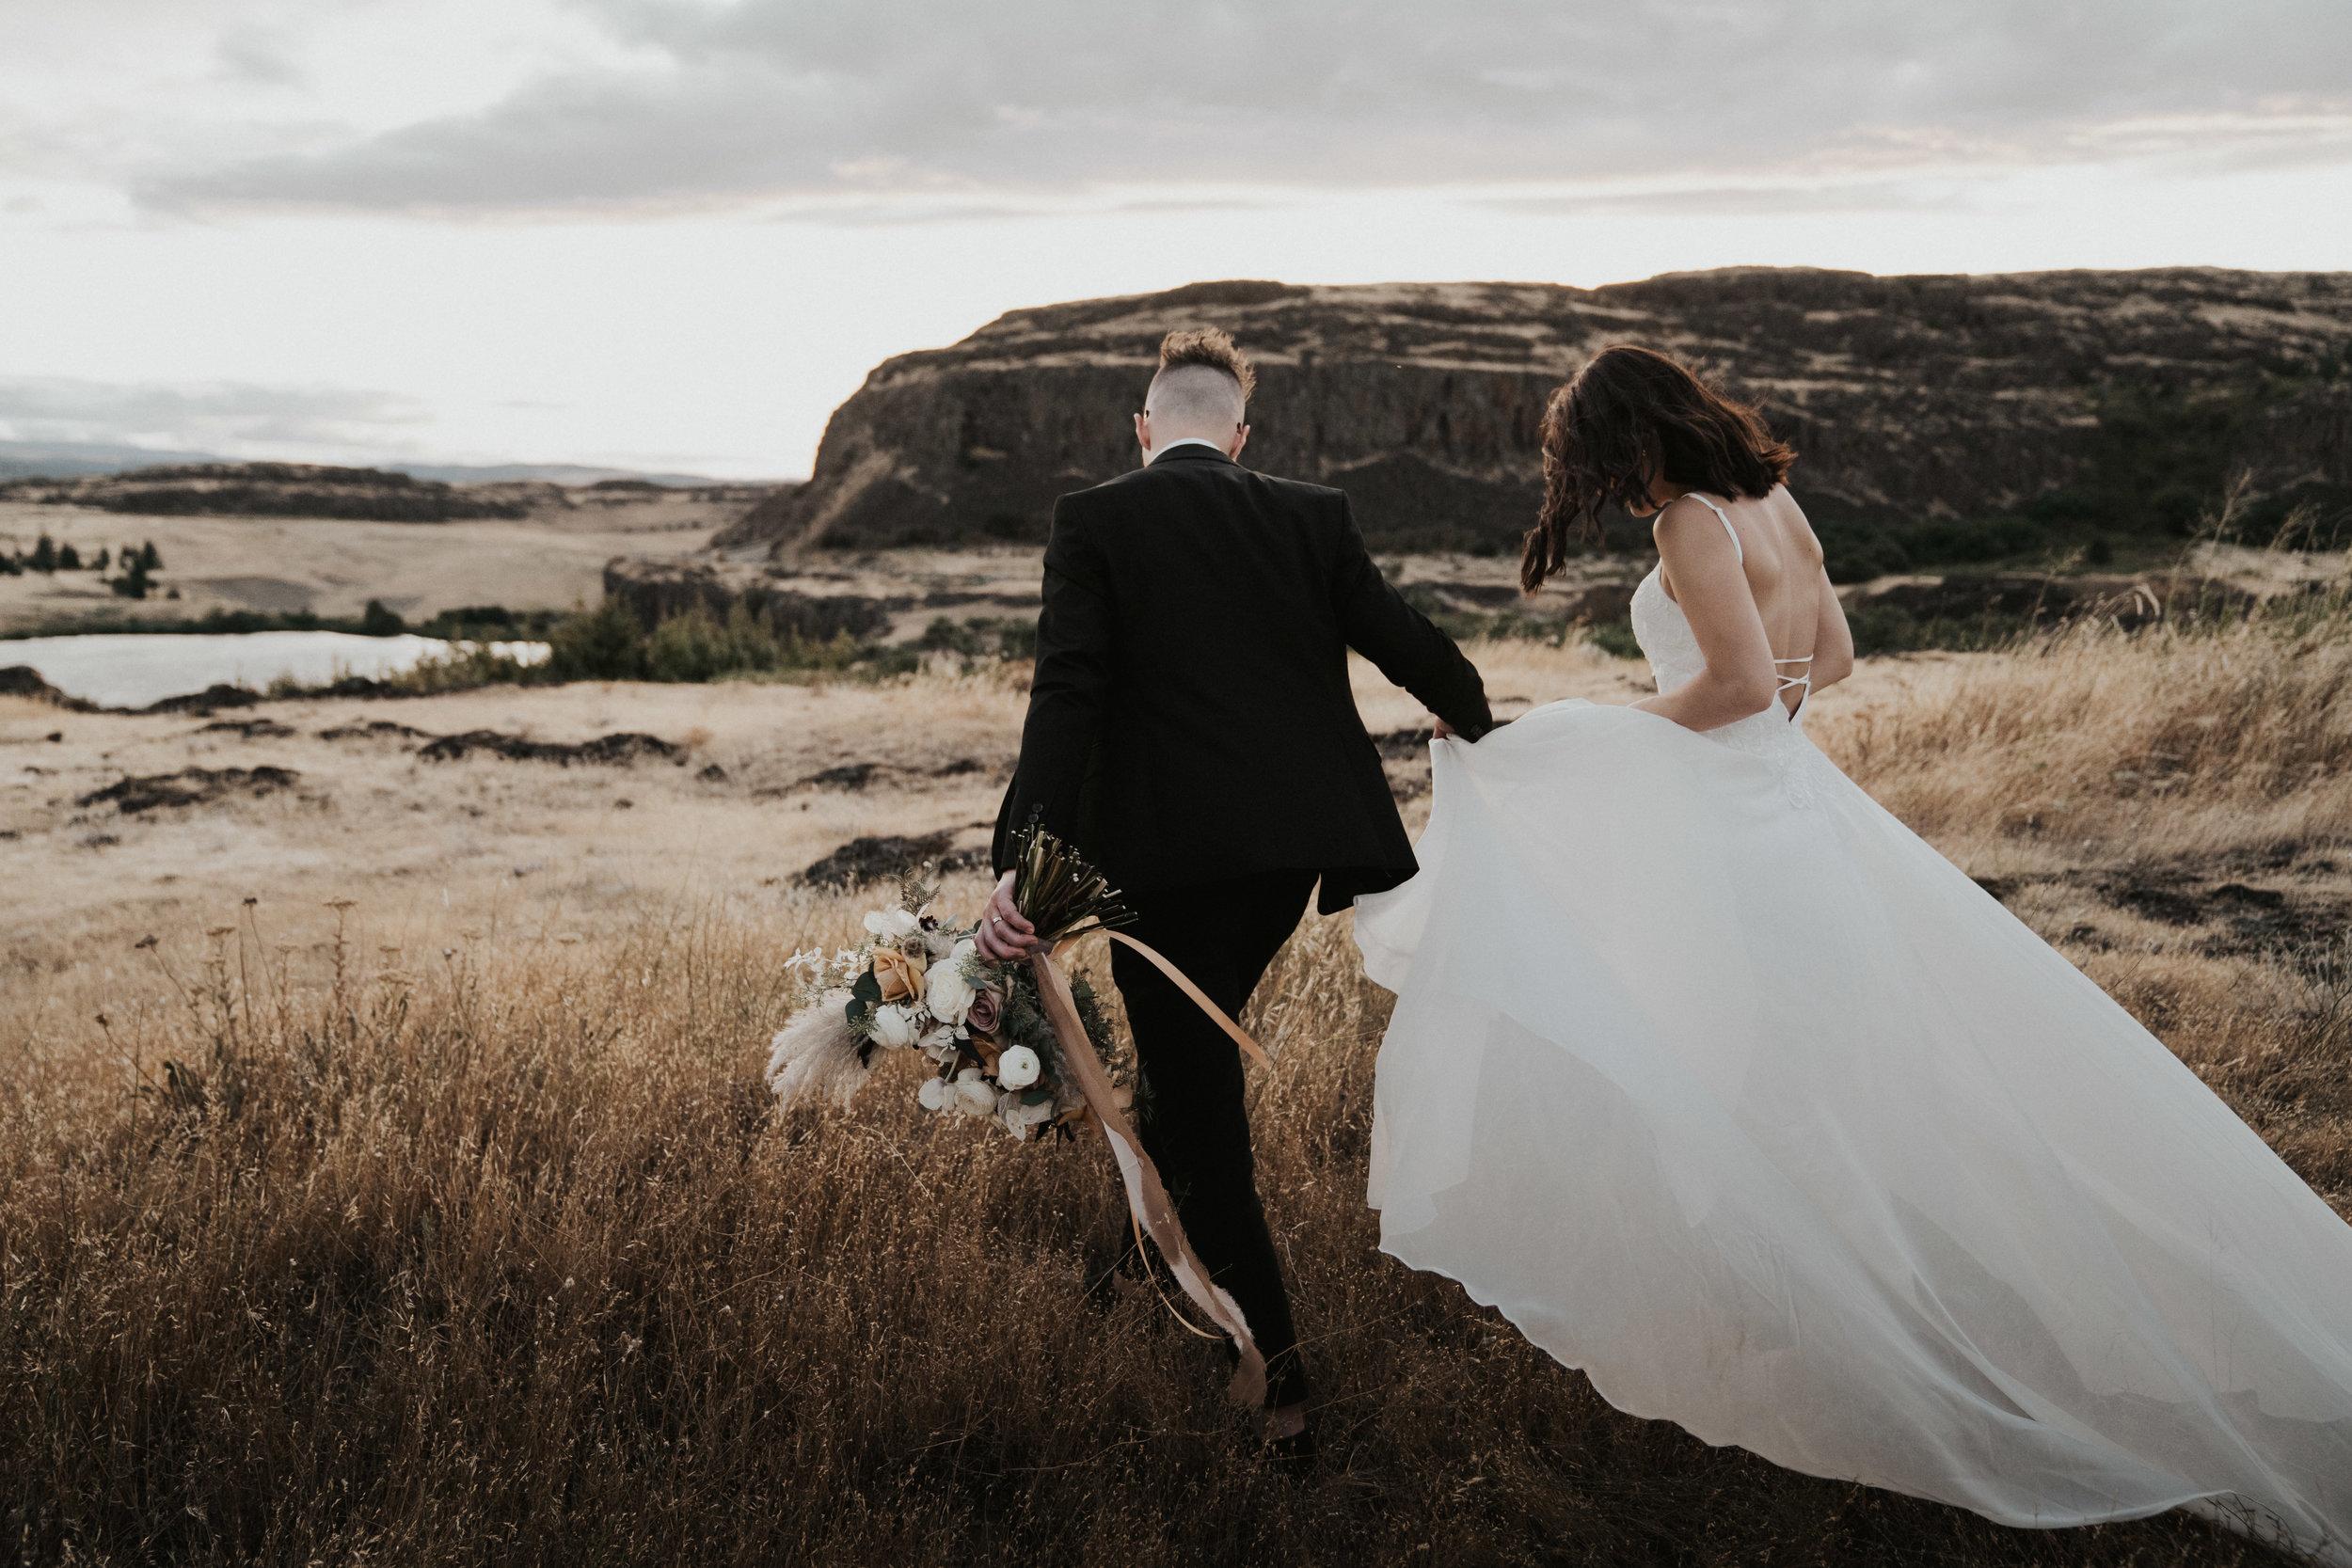 columbia-river-gorge-wedding-elopement-inspiration-32.jpg